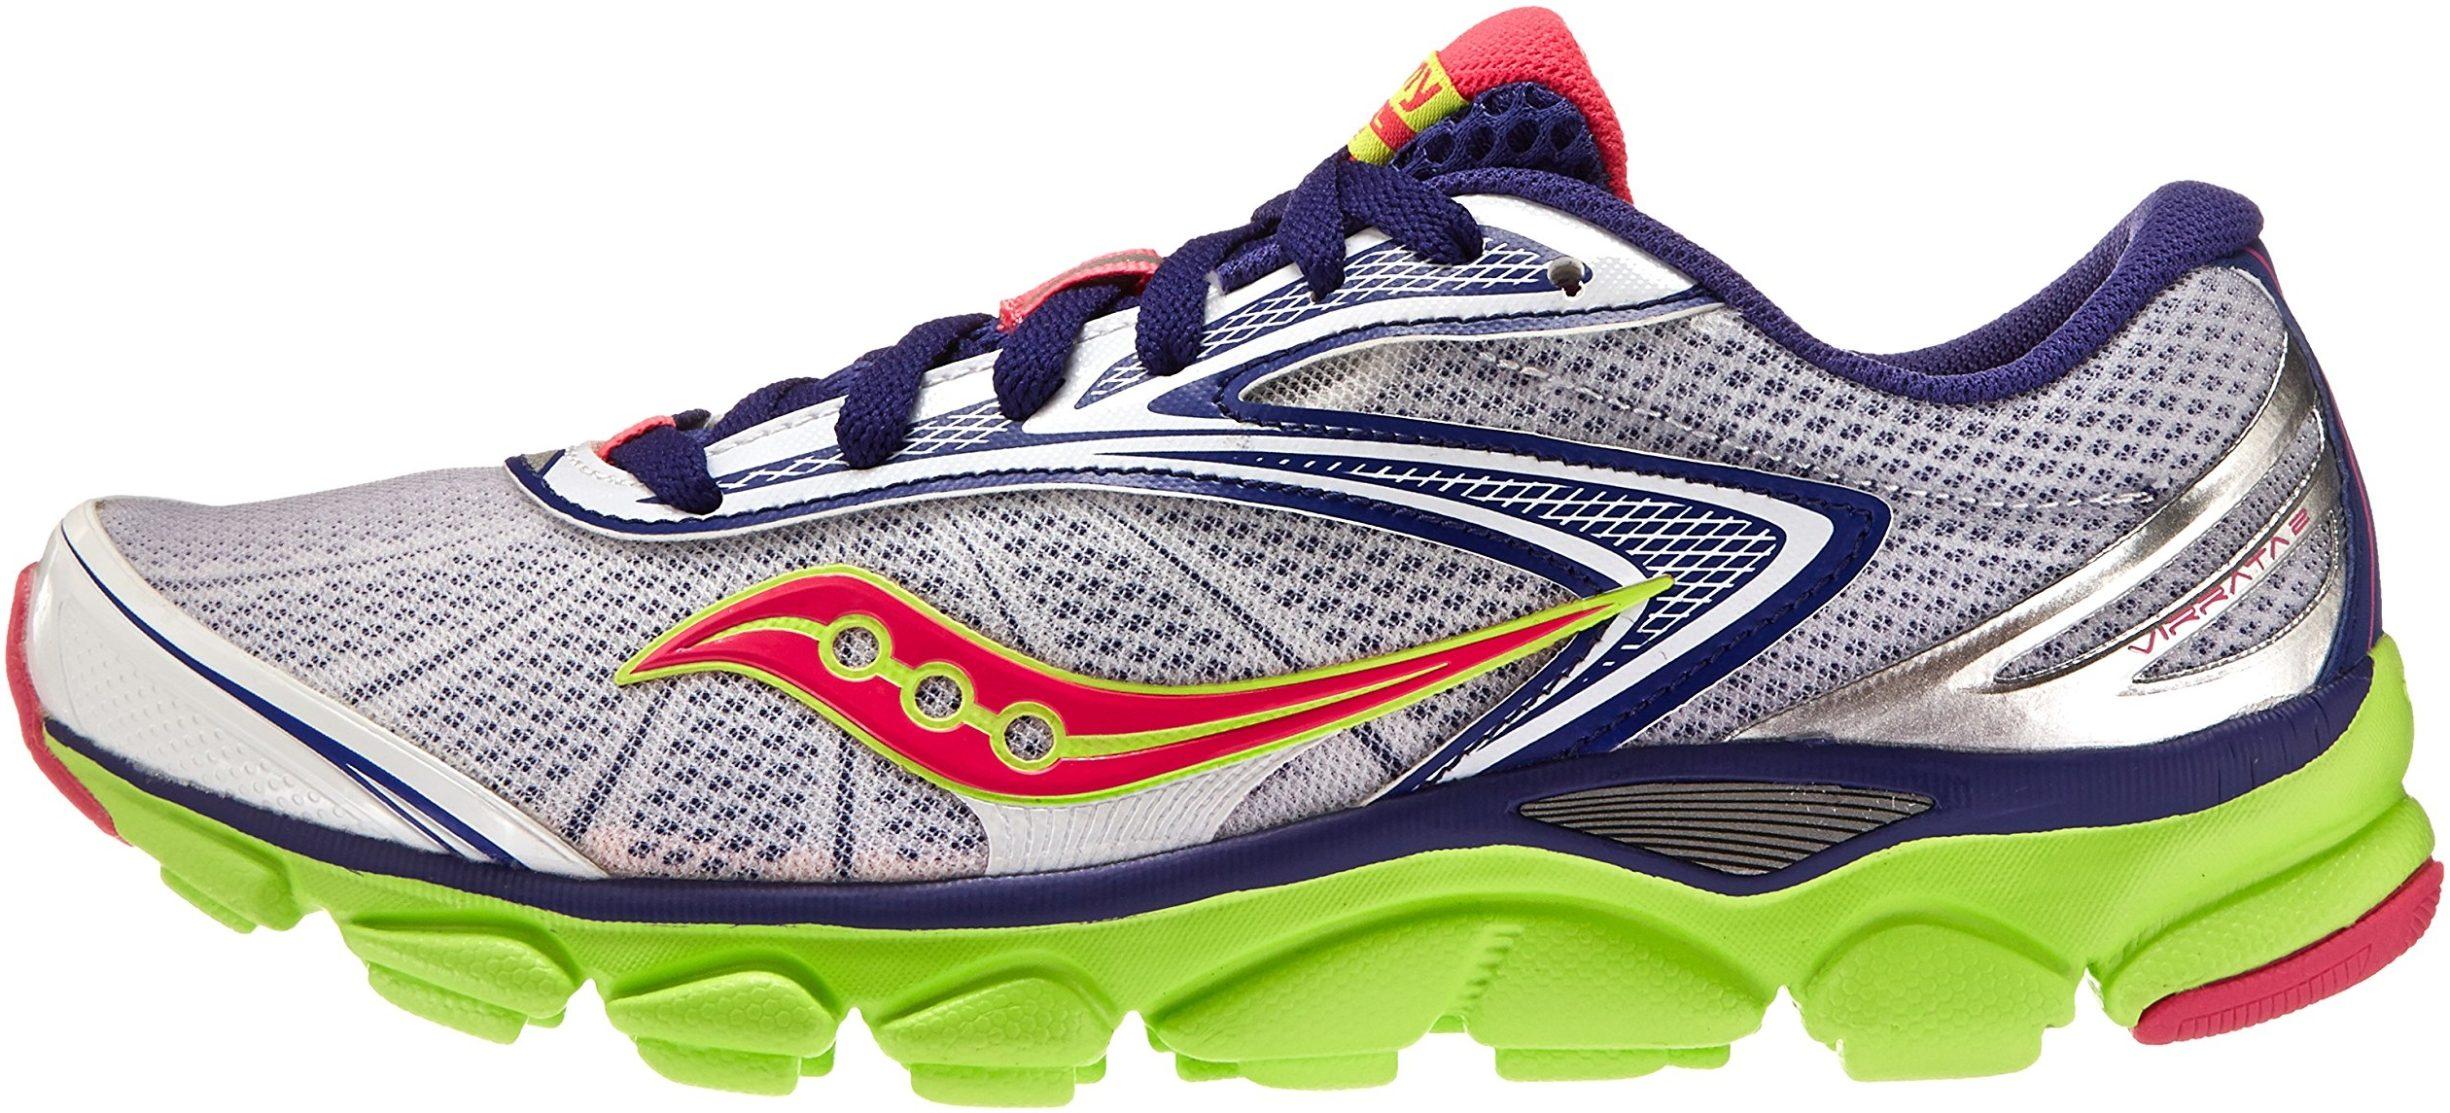 Saucony Minimalist Running Shoes (2